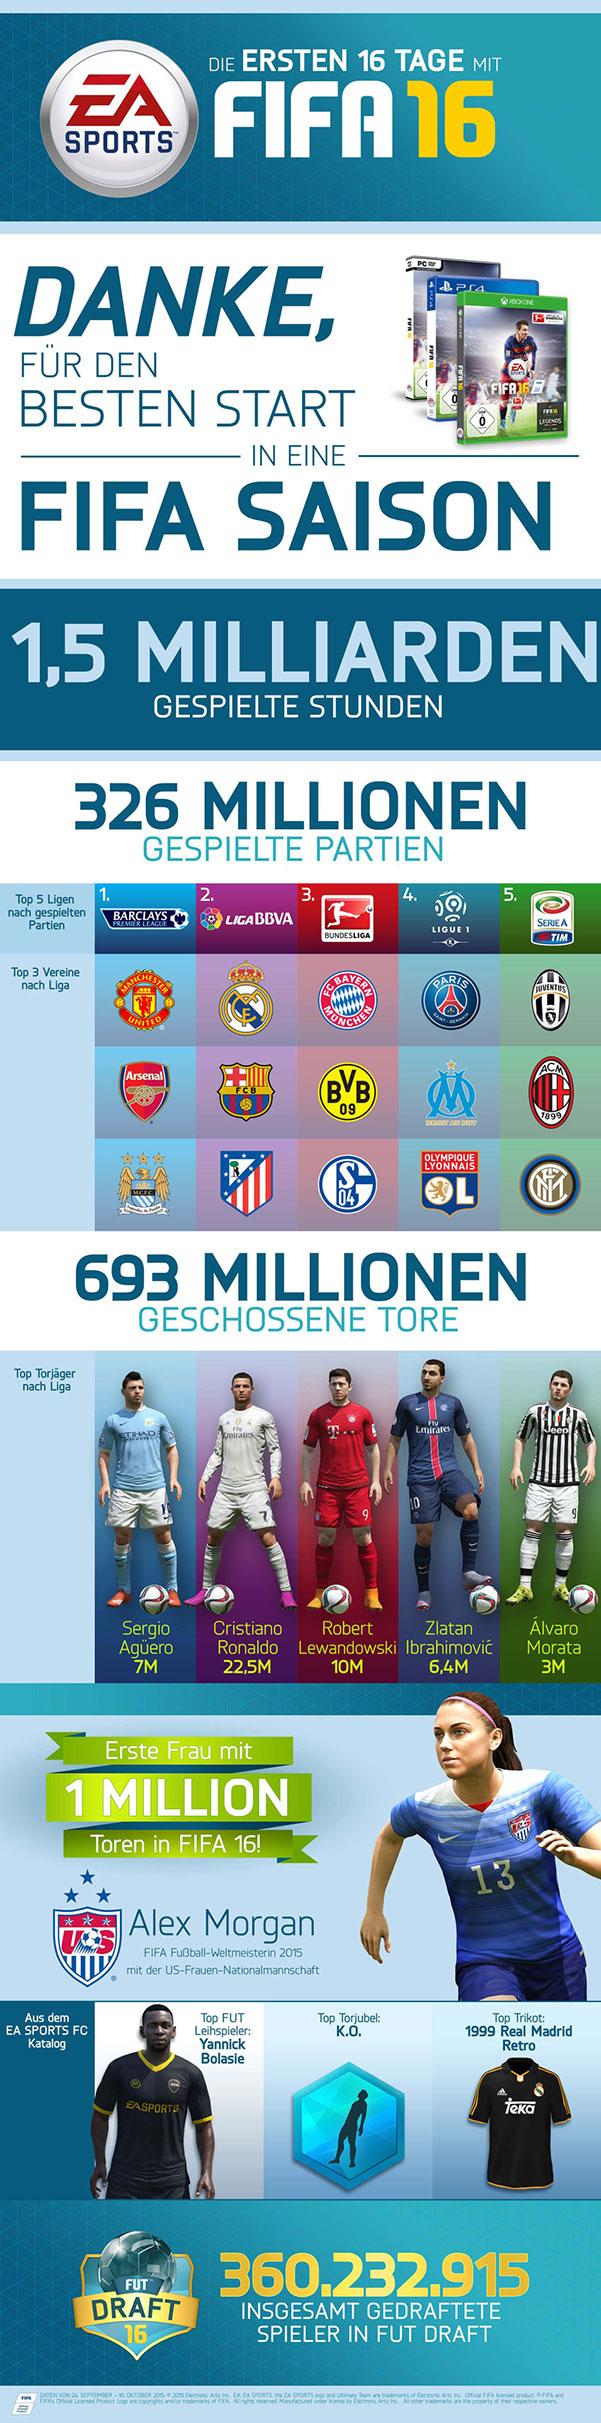 FIFA 16 - Infografik